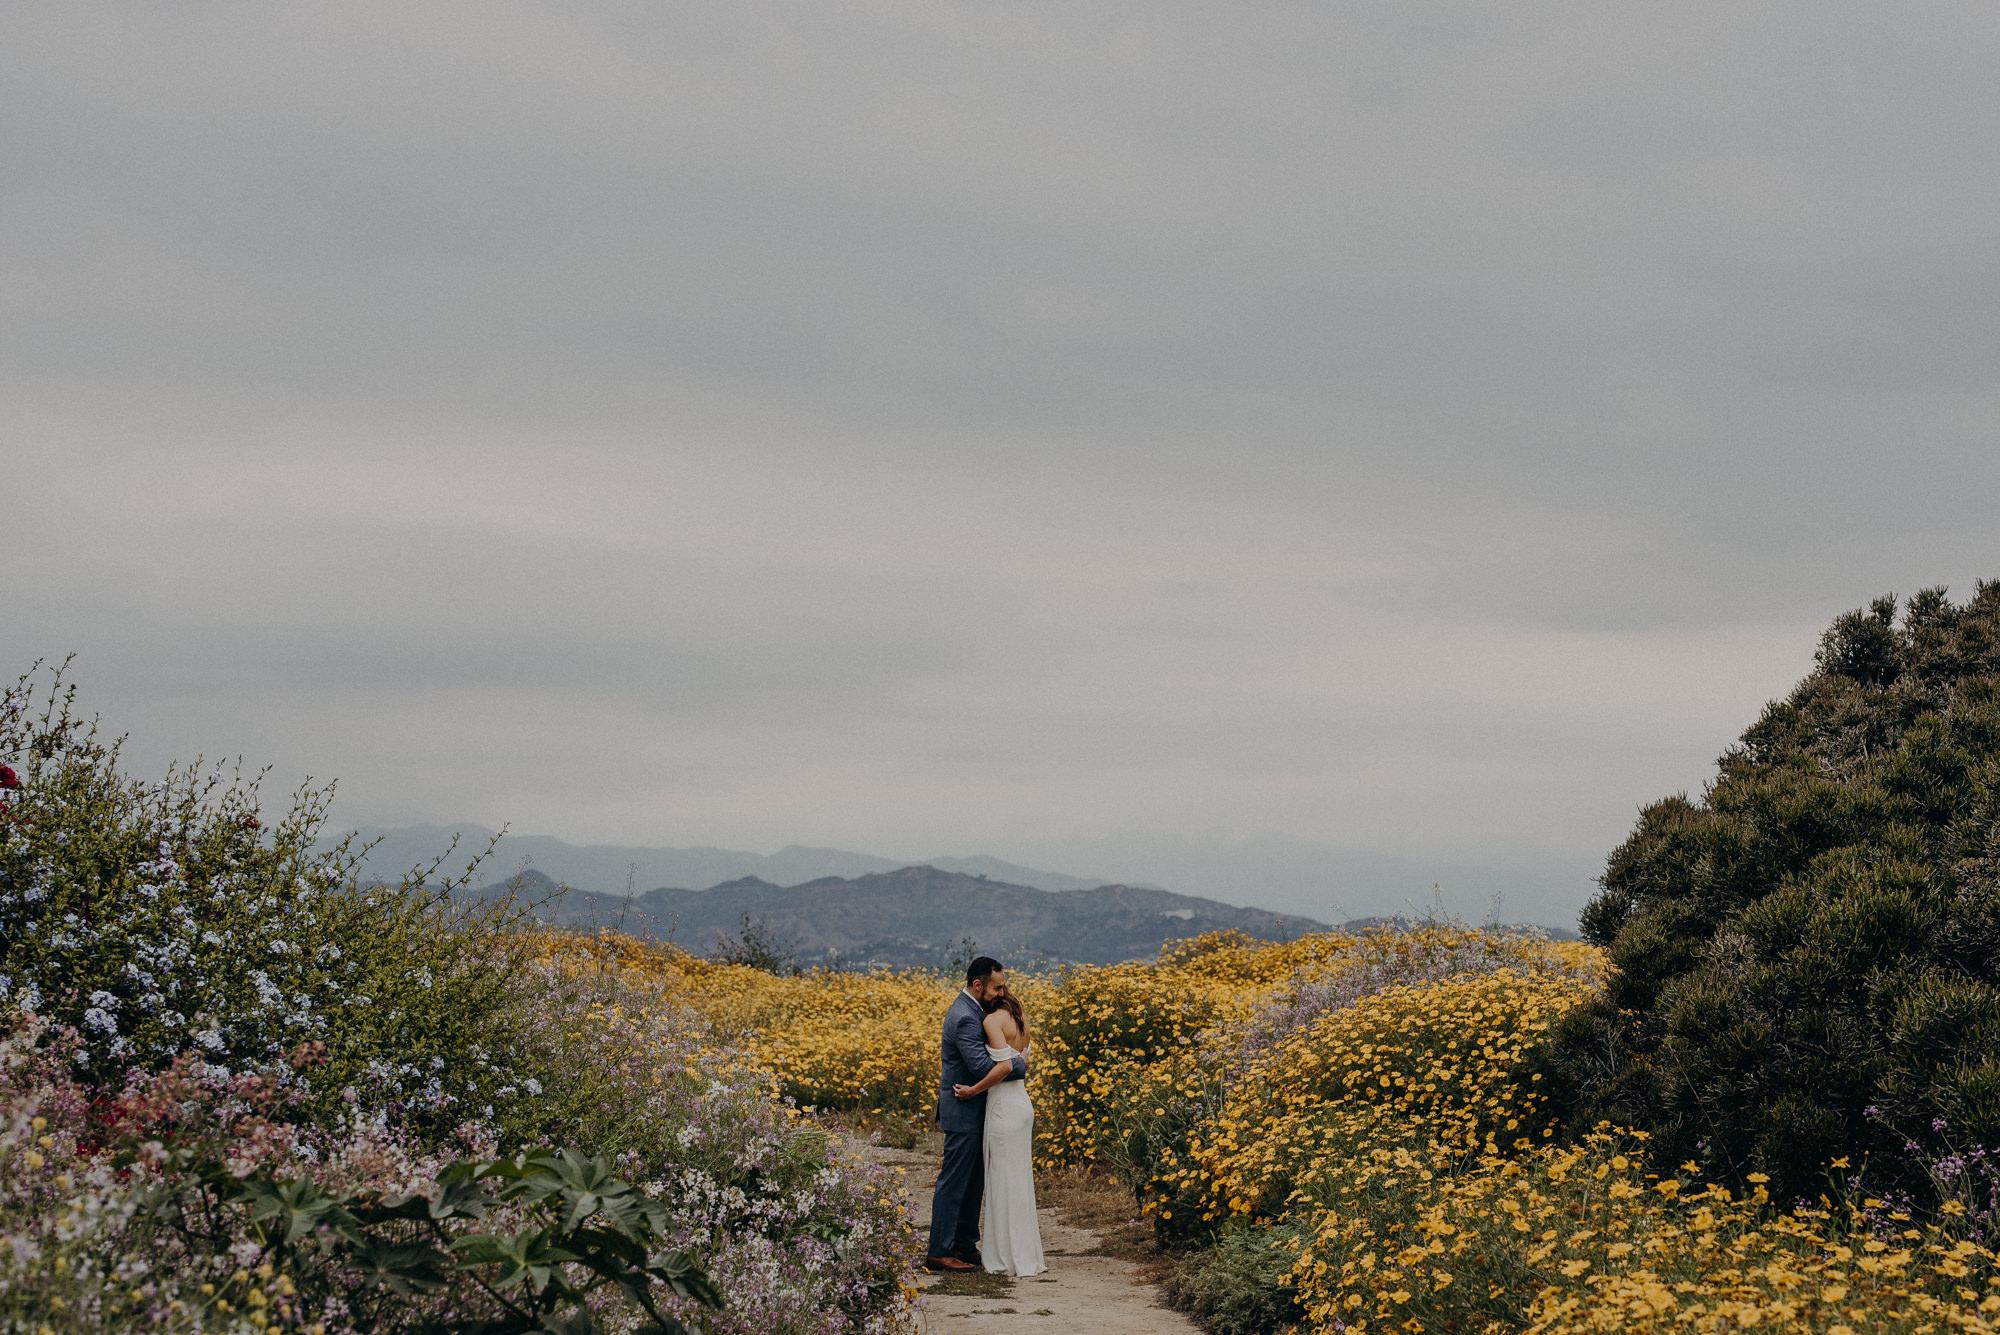 elopement photographer in los angeles - la wedding photographer - isaiahandtaylor.com-025.jpg